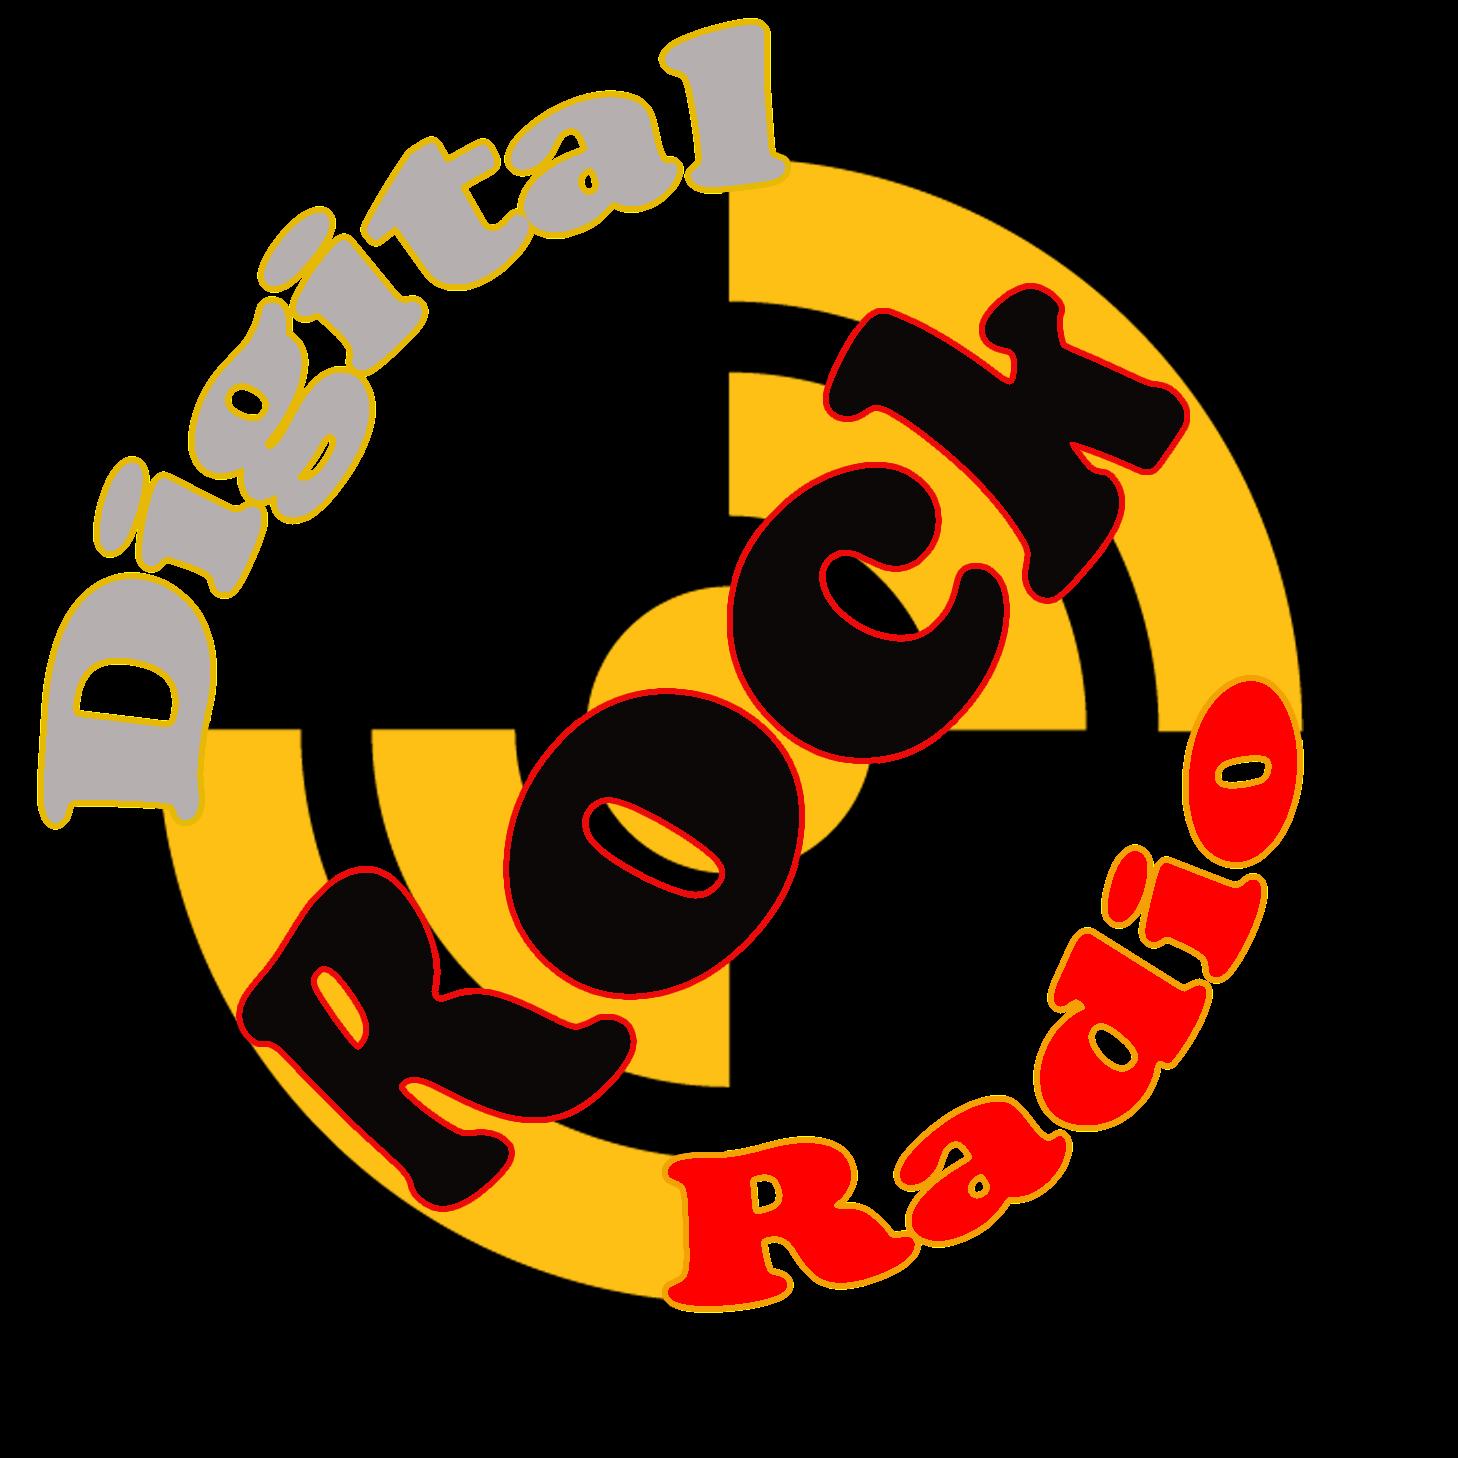 DIGITAL ROCK RADIO ONLINE